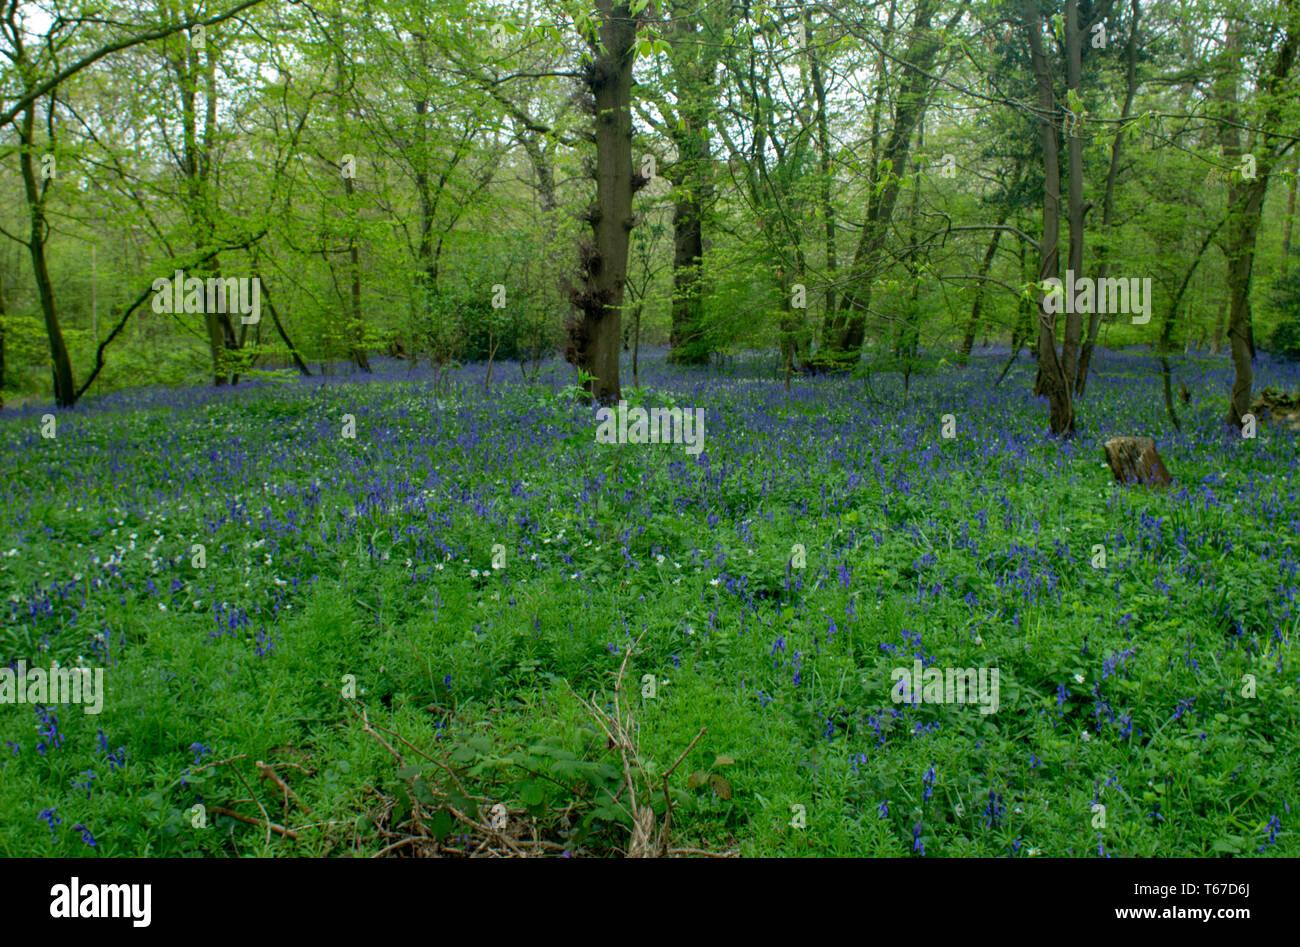 Bluebells carpet the floor of mature woodland - Stock Image